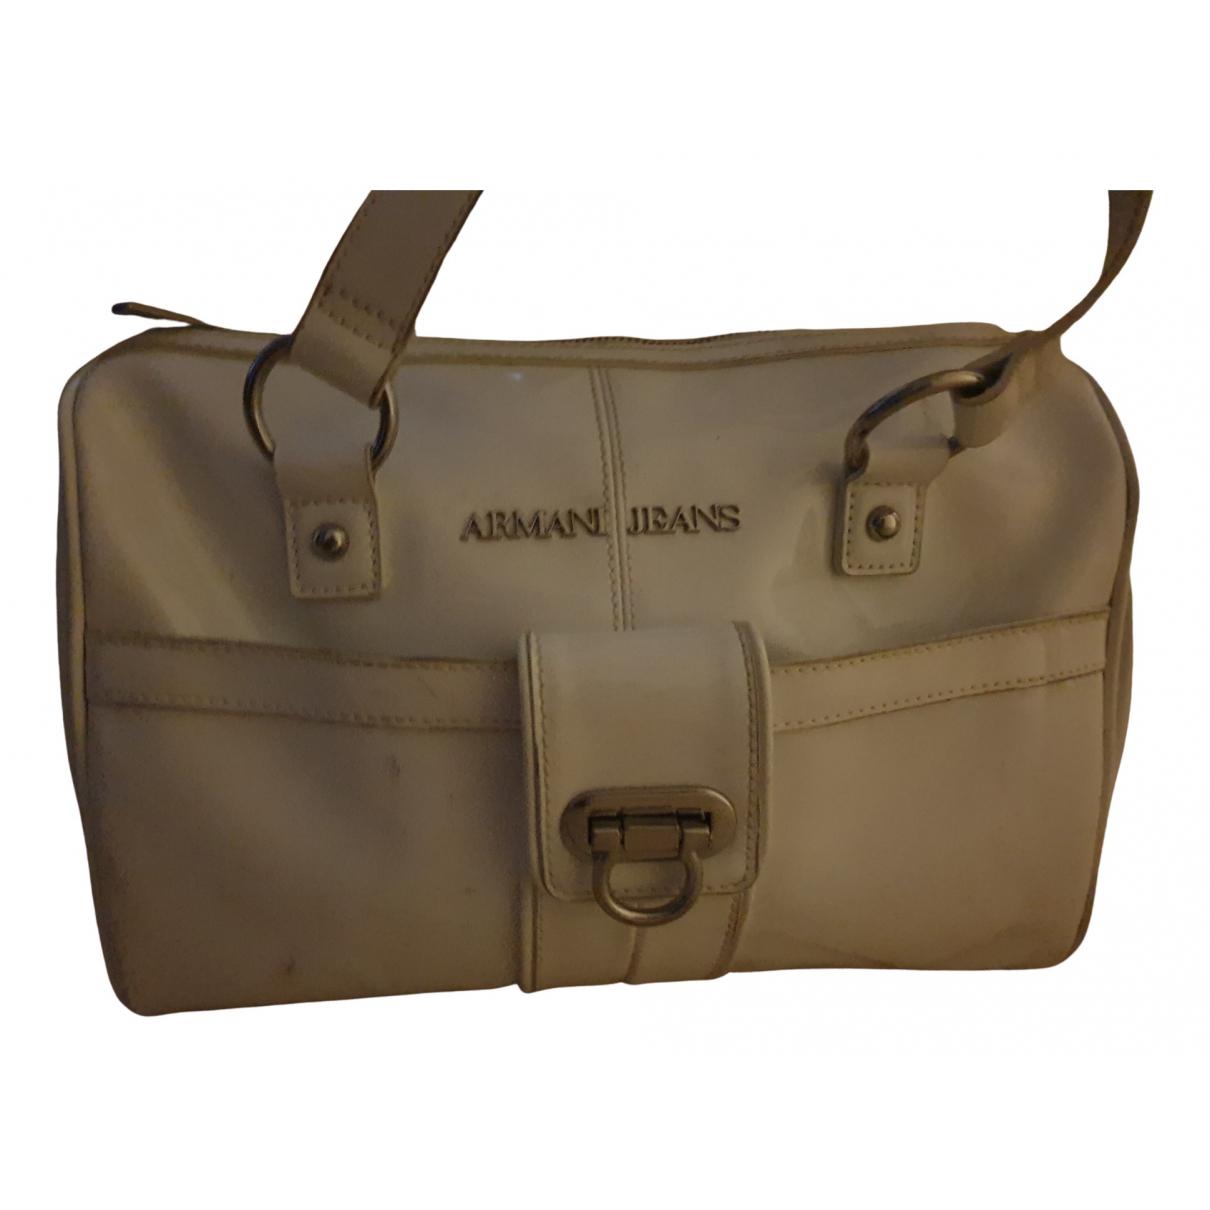 Armani Jeans \N White Patent leather handbag for Women \N